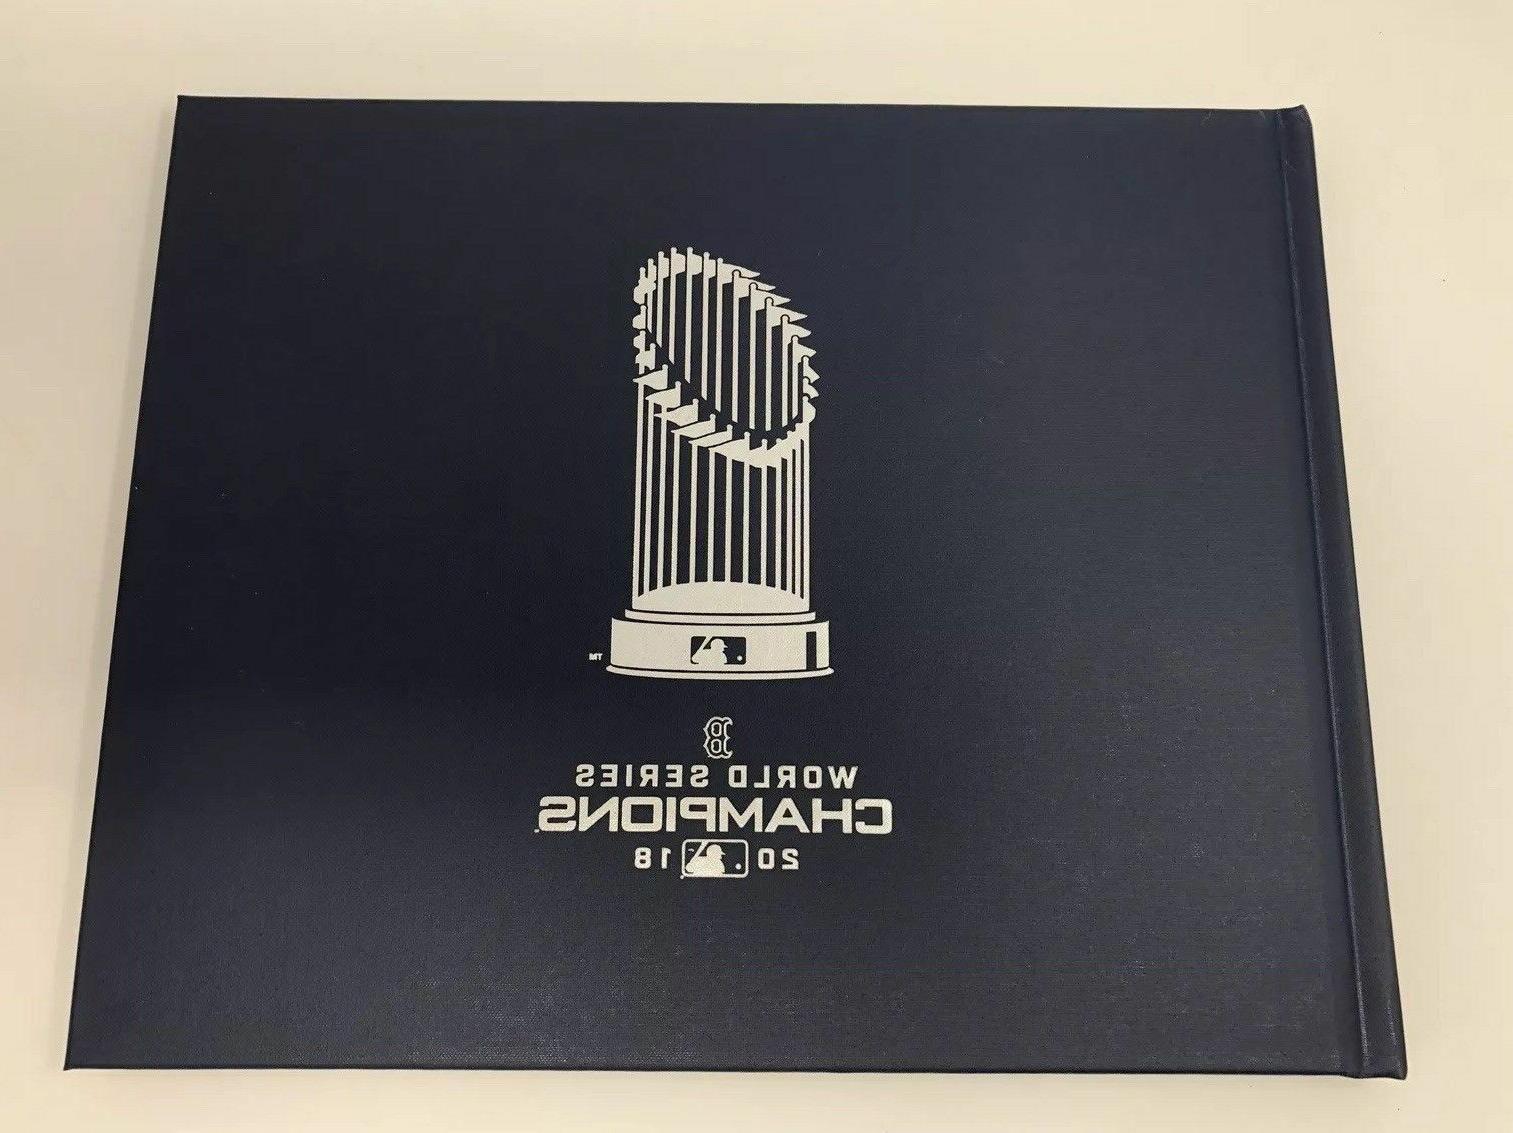 boston red sox season ticket holder 2018